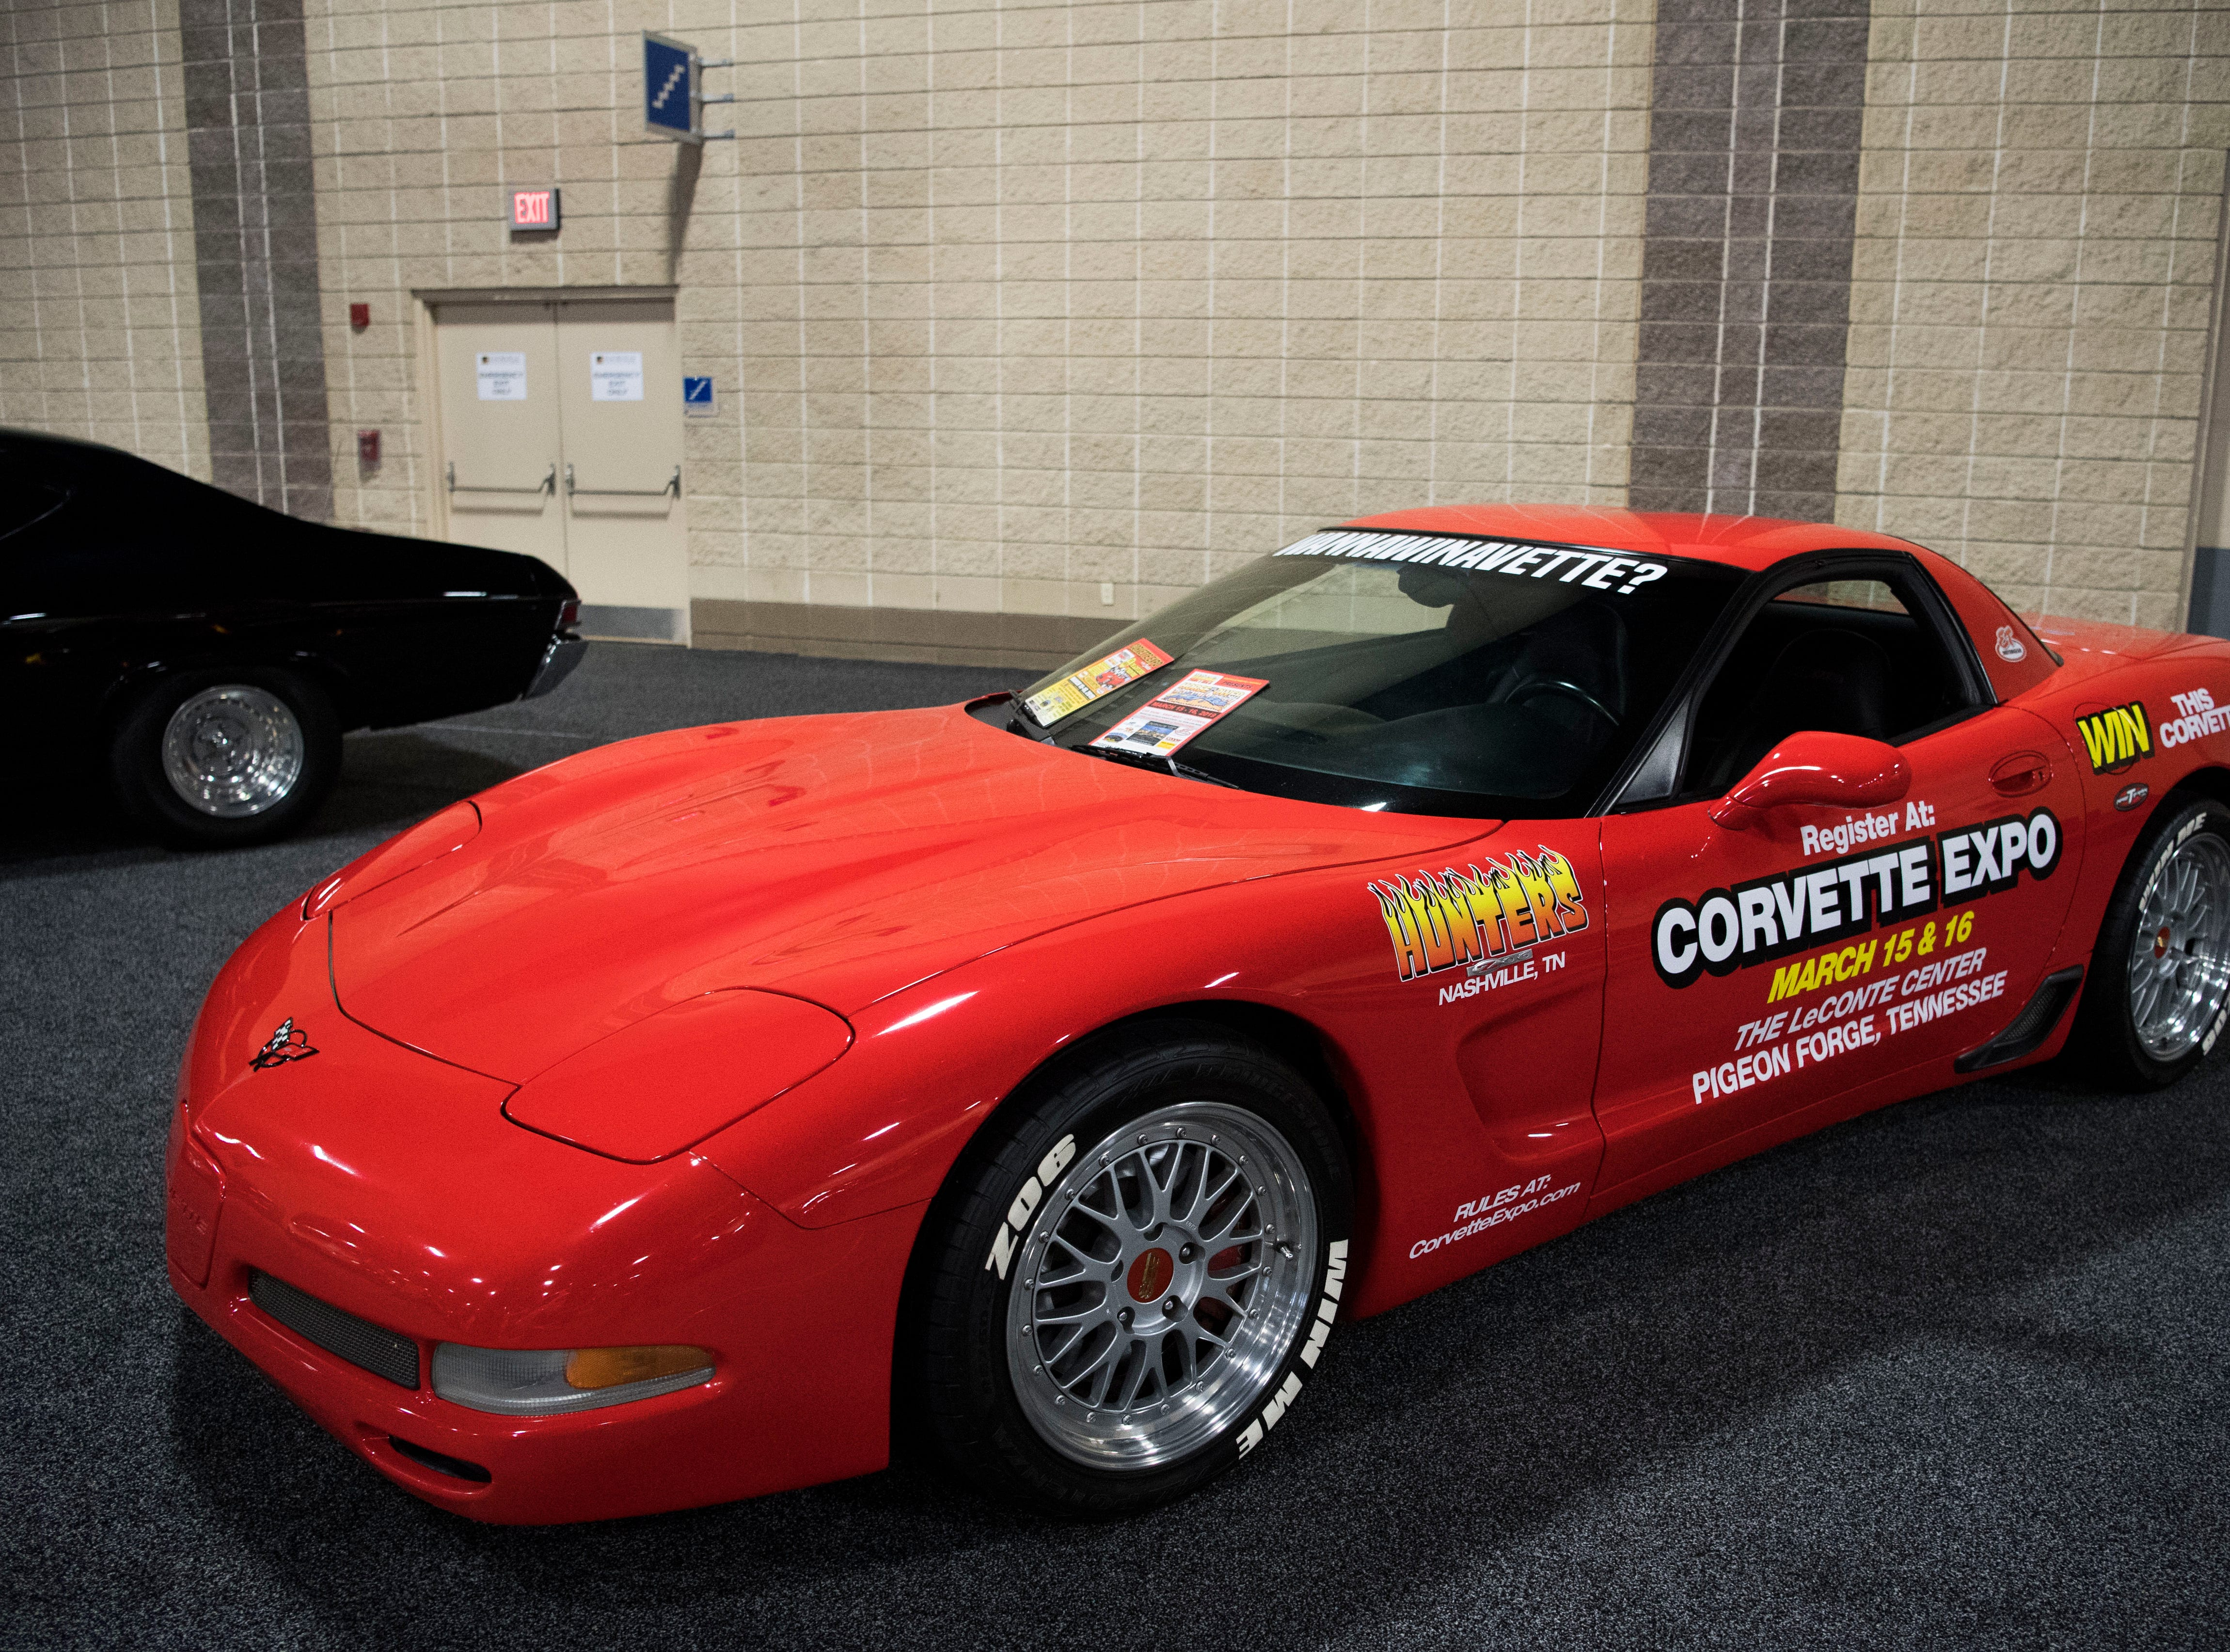 A classic car at the Knox News Auto Show Thursday, Feb. 21, 2019.